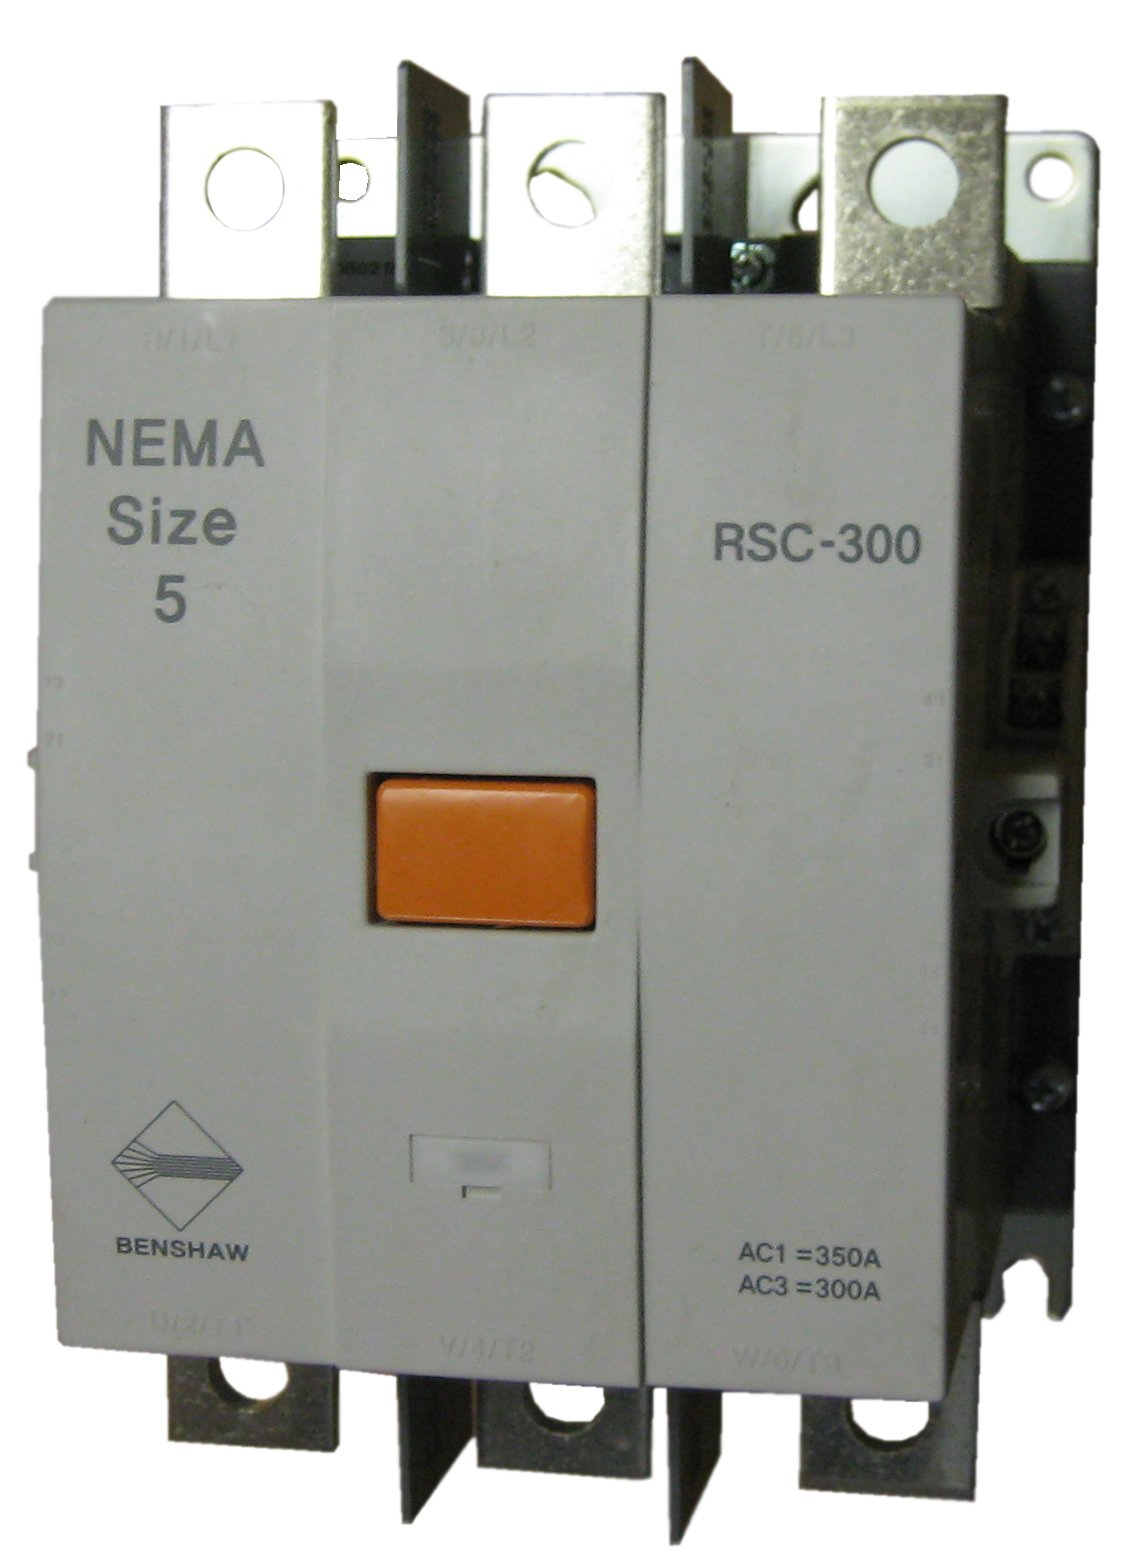 2.4 H x 2.0 W x 1.6 D 0.5 Amp 4.5W 9V Jameco Reliapro GPU41090500WD00 AC-to-DC Regulated Linear Wall Adapter